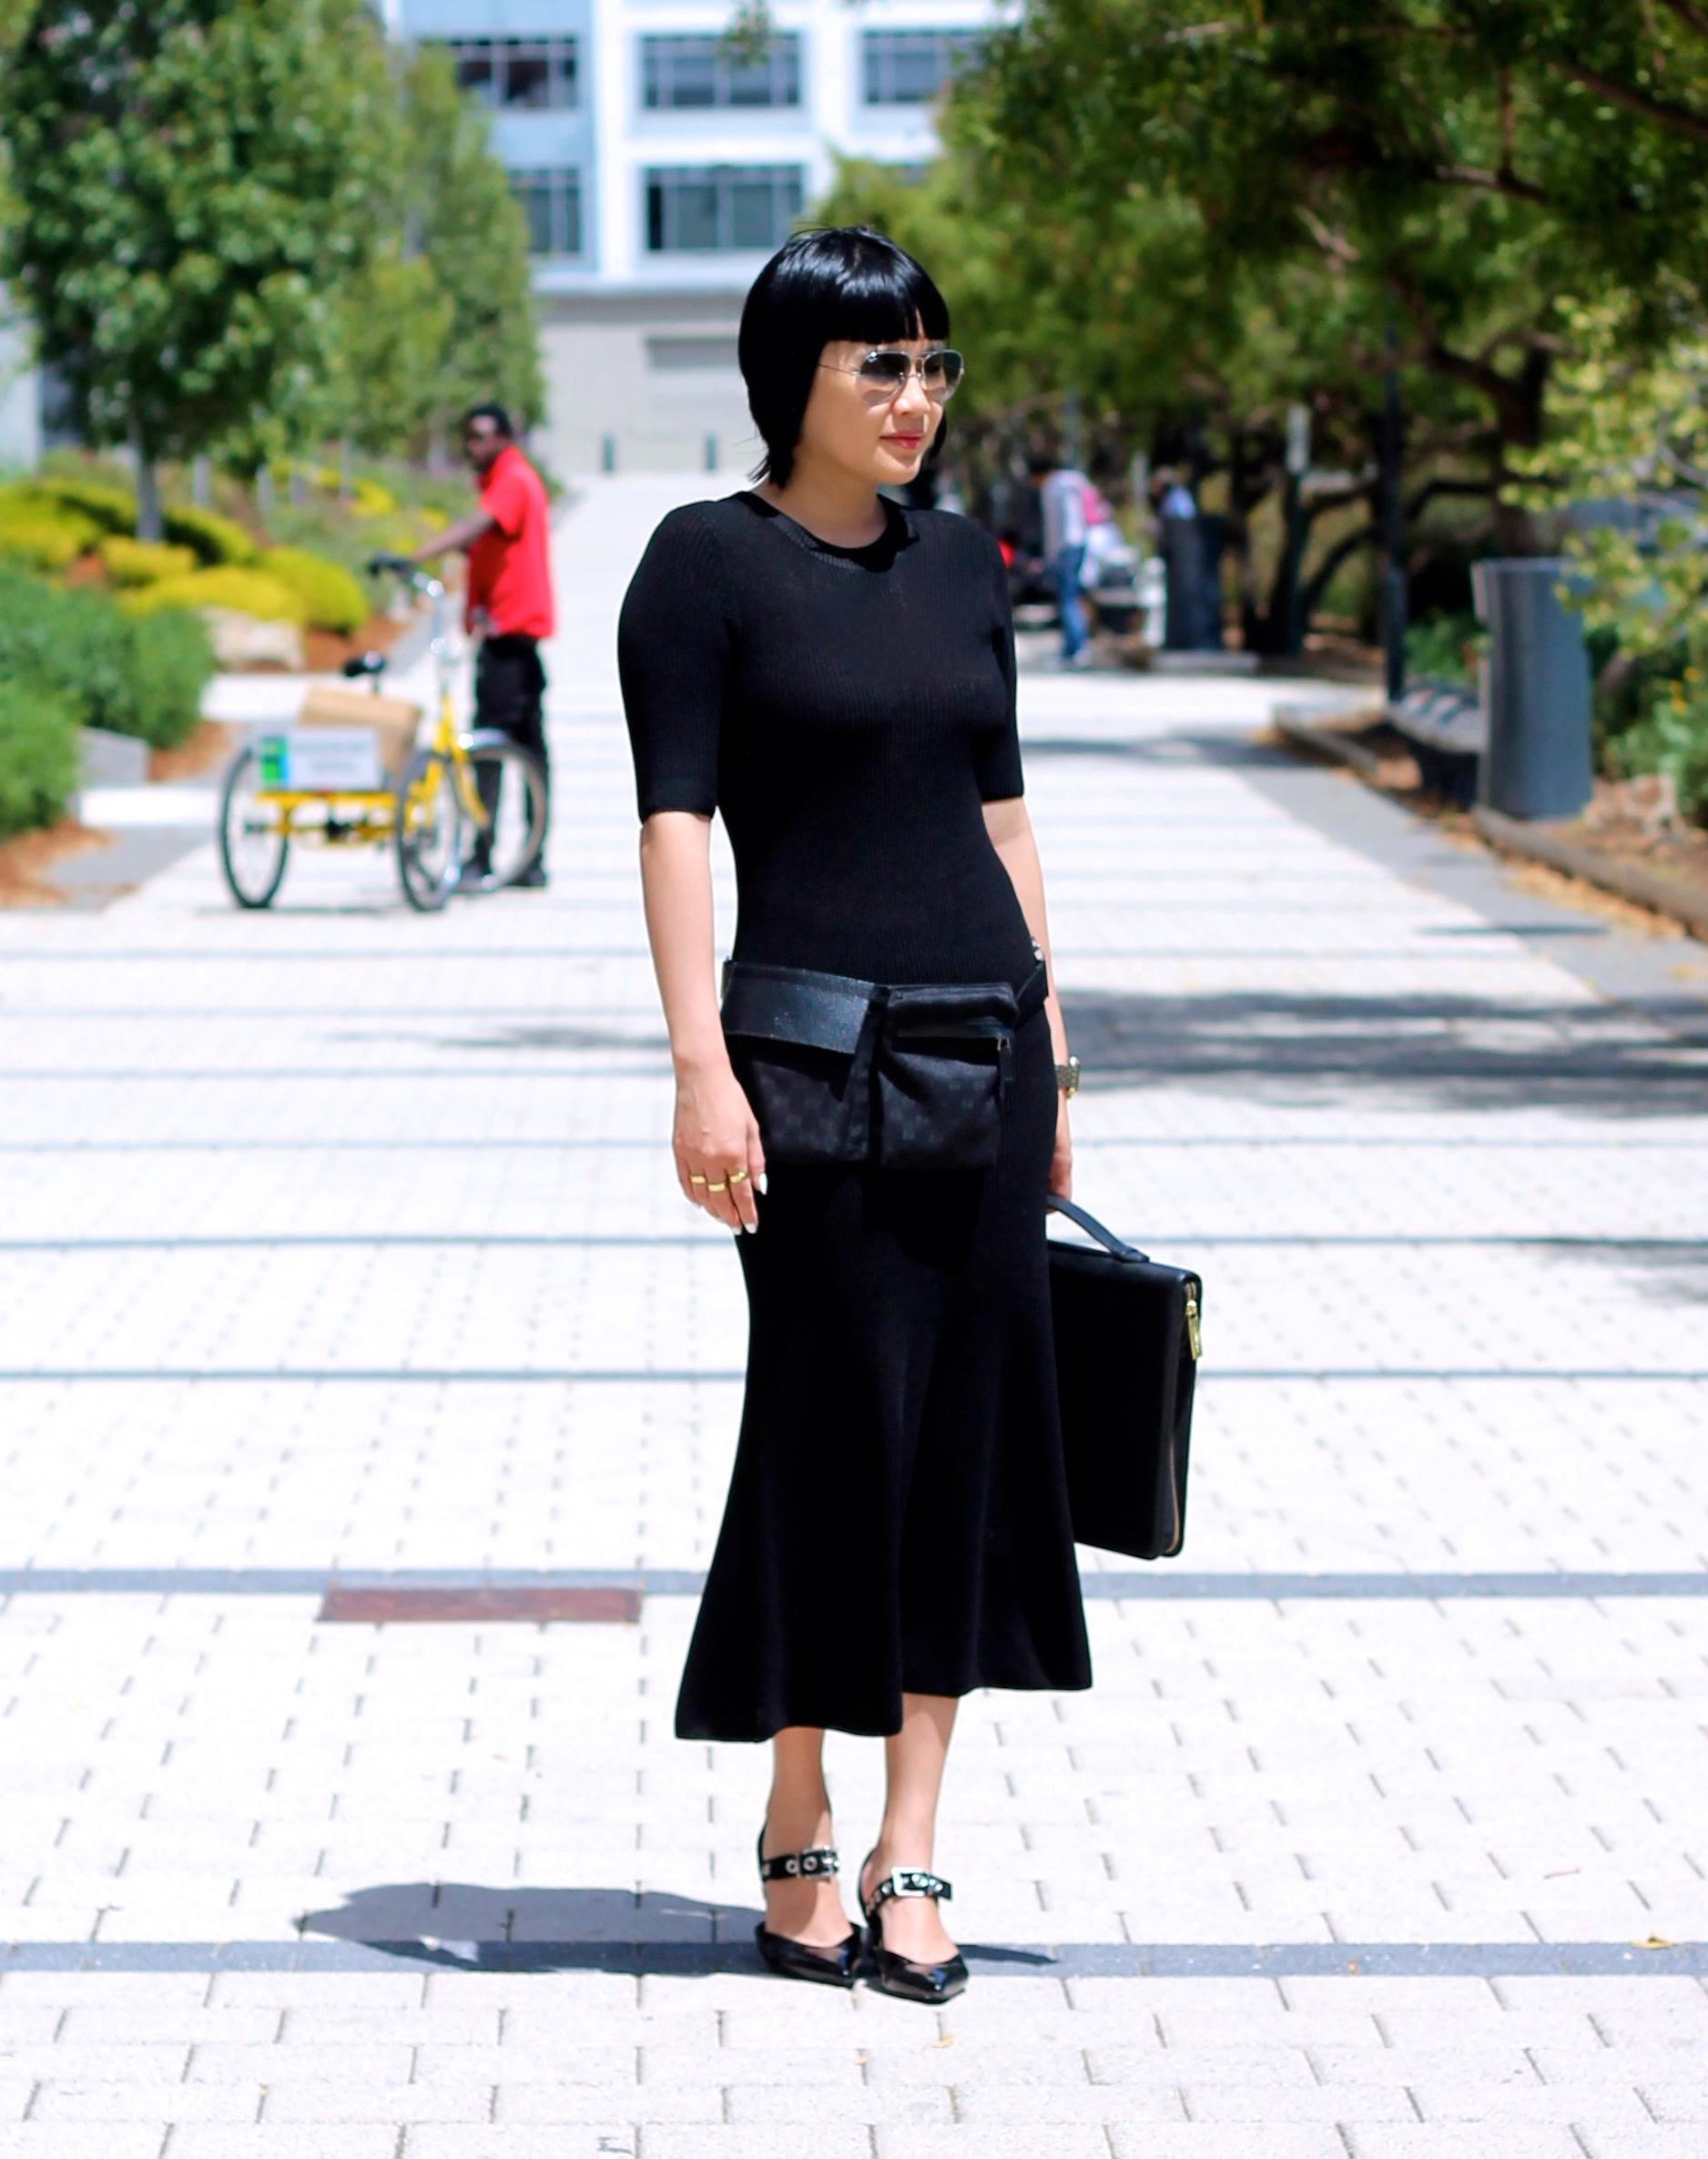 Aritzia dress, Gucci fanny pack, Robert Clergerie shoes c/o Farfetch, Ray-Ban sunglasses, Coach bag